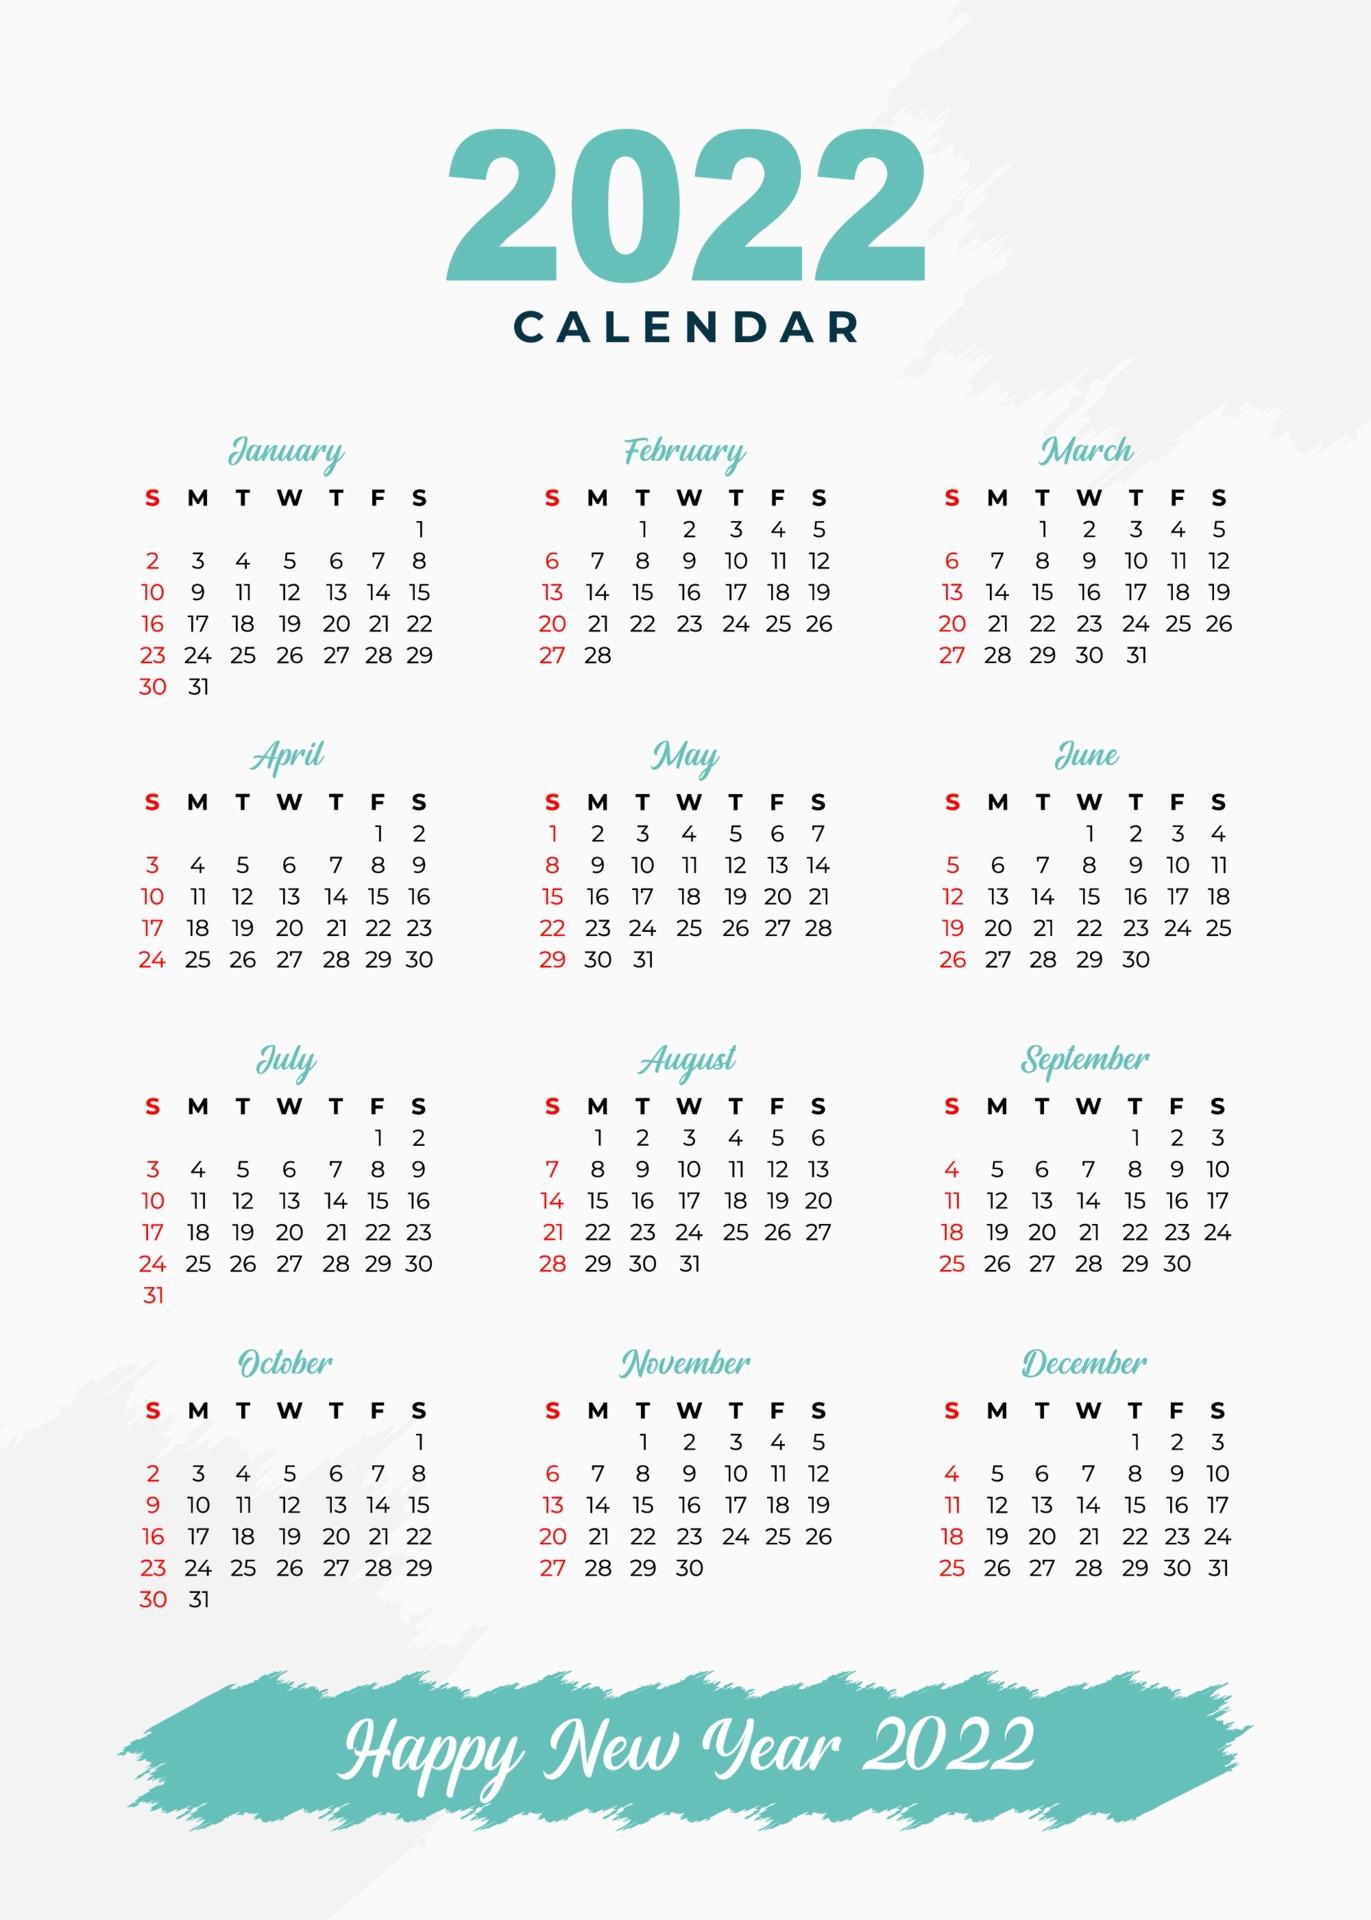 Calendar 2022 Template.Simply Elegant Design 2022 Calendar Template 2198759 Vector Art At Vecteezy